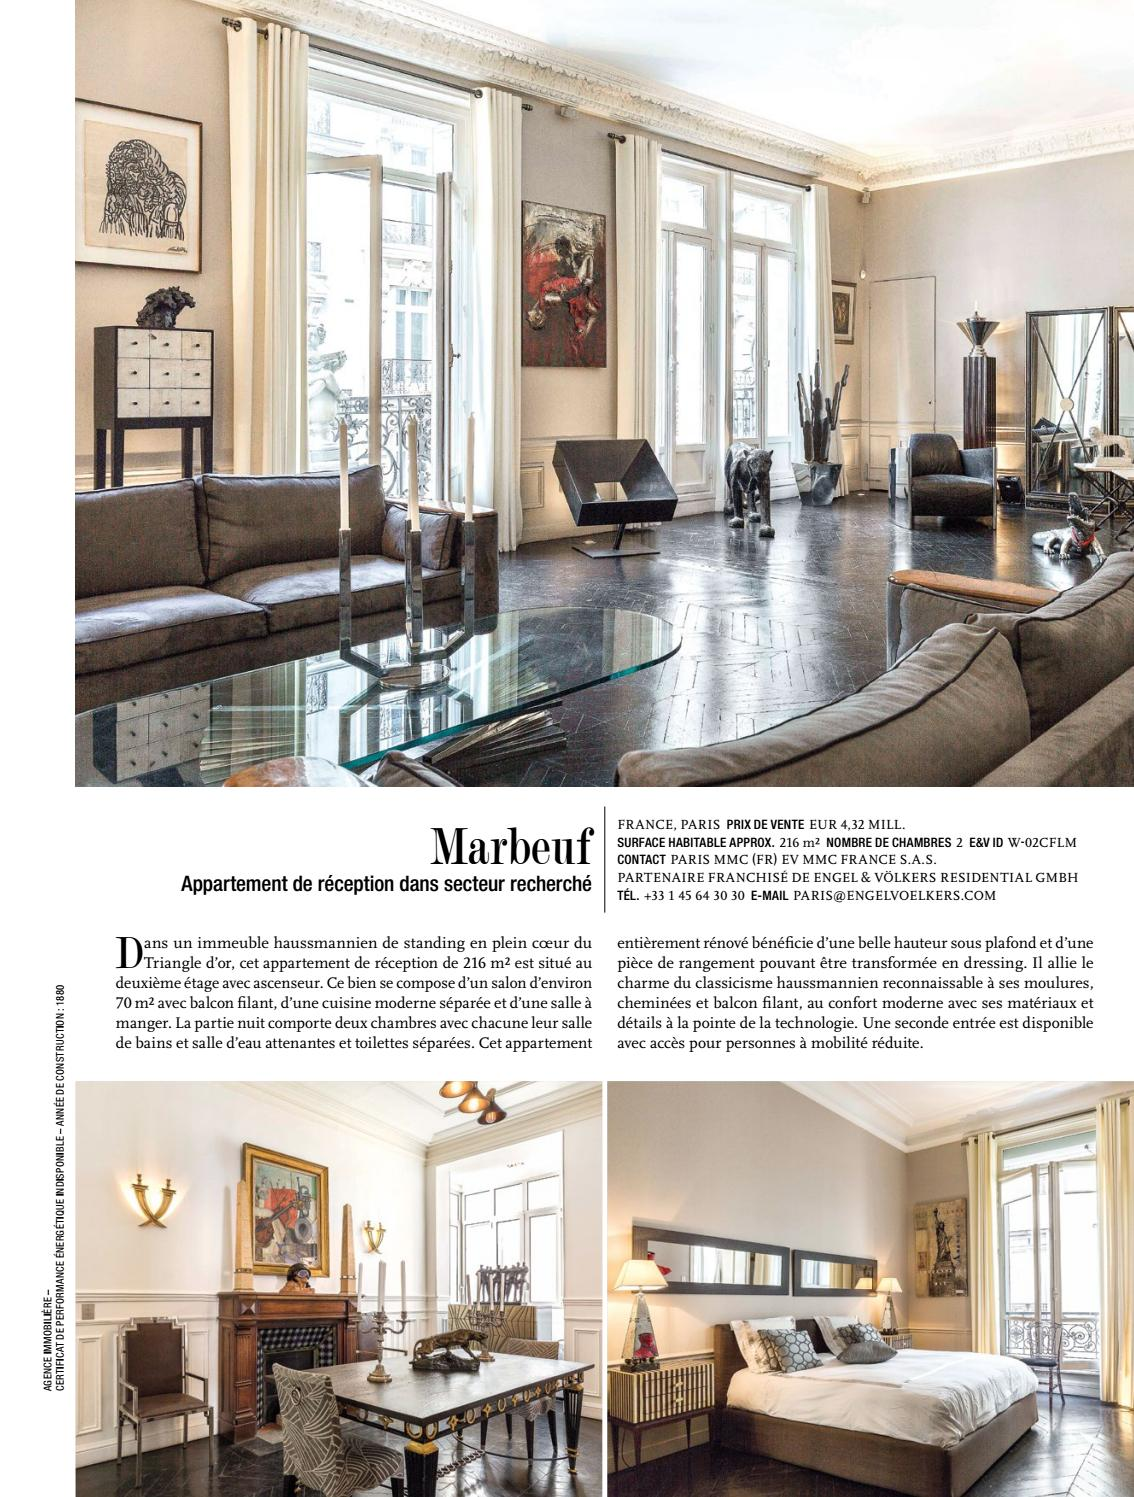 Cuisine Séparée Du Salon gg magazine 04/18 francegg-magazine - issuu